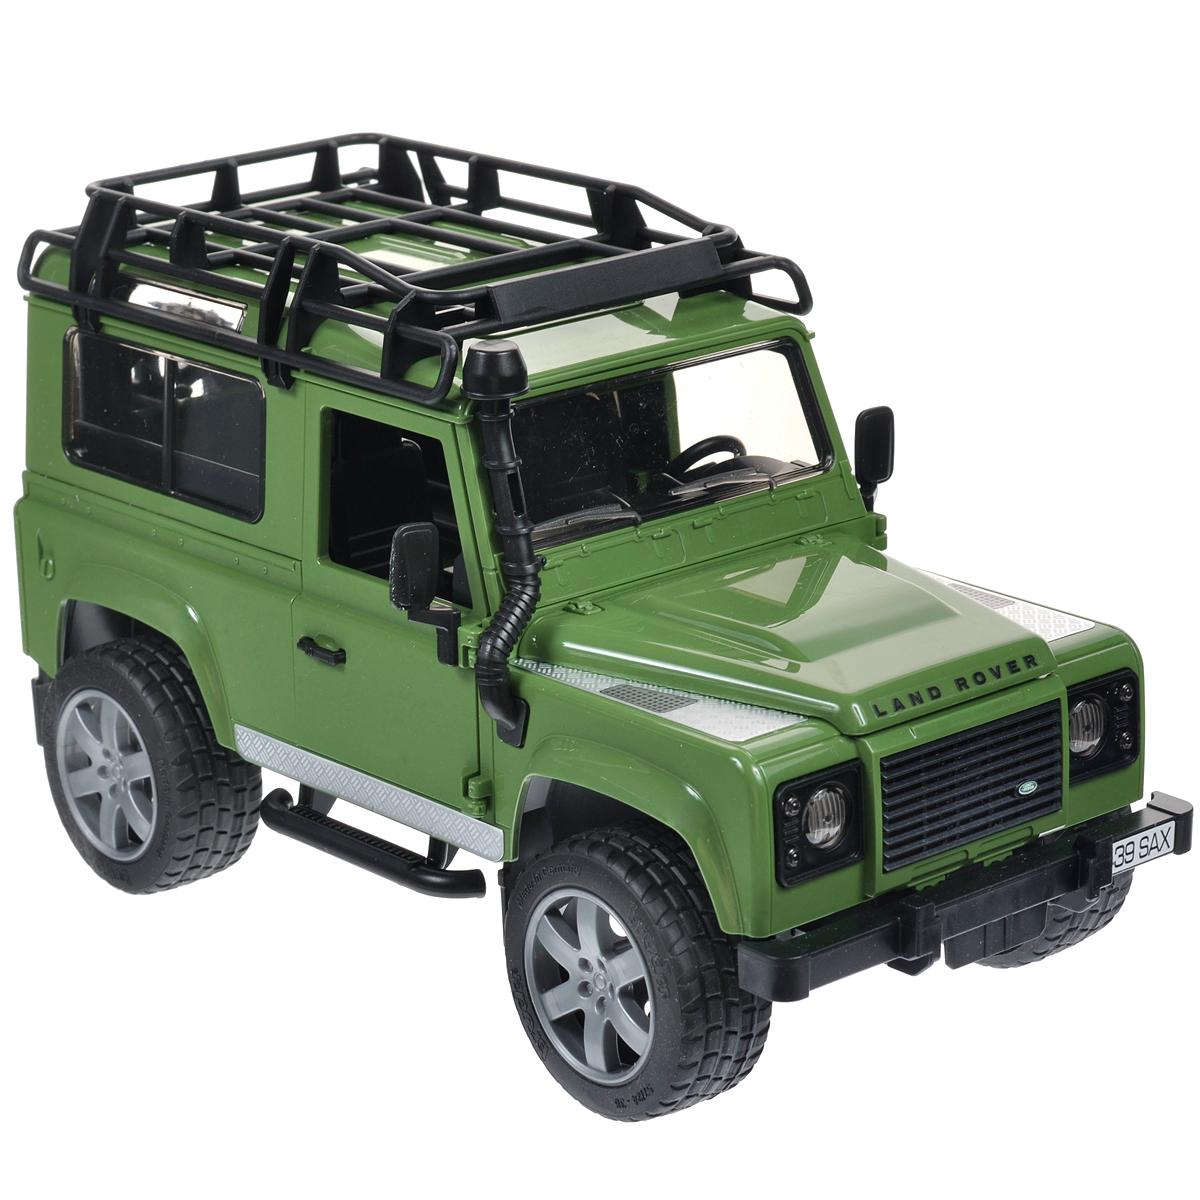 Bruder Внедорожник Land Rover Defender цвет зеленый bruder внедорожник land rover defender